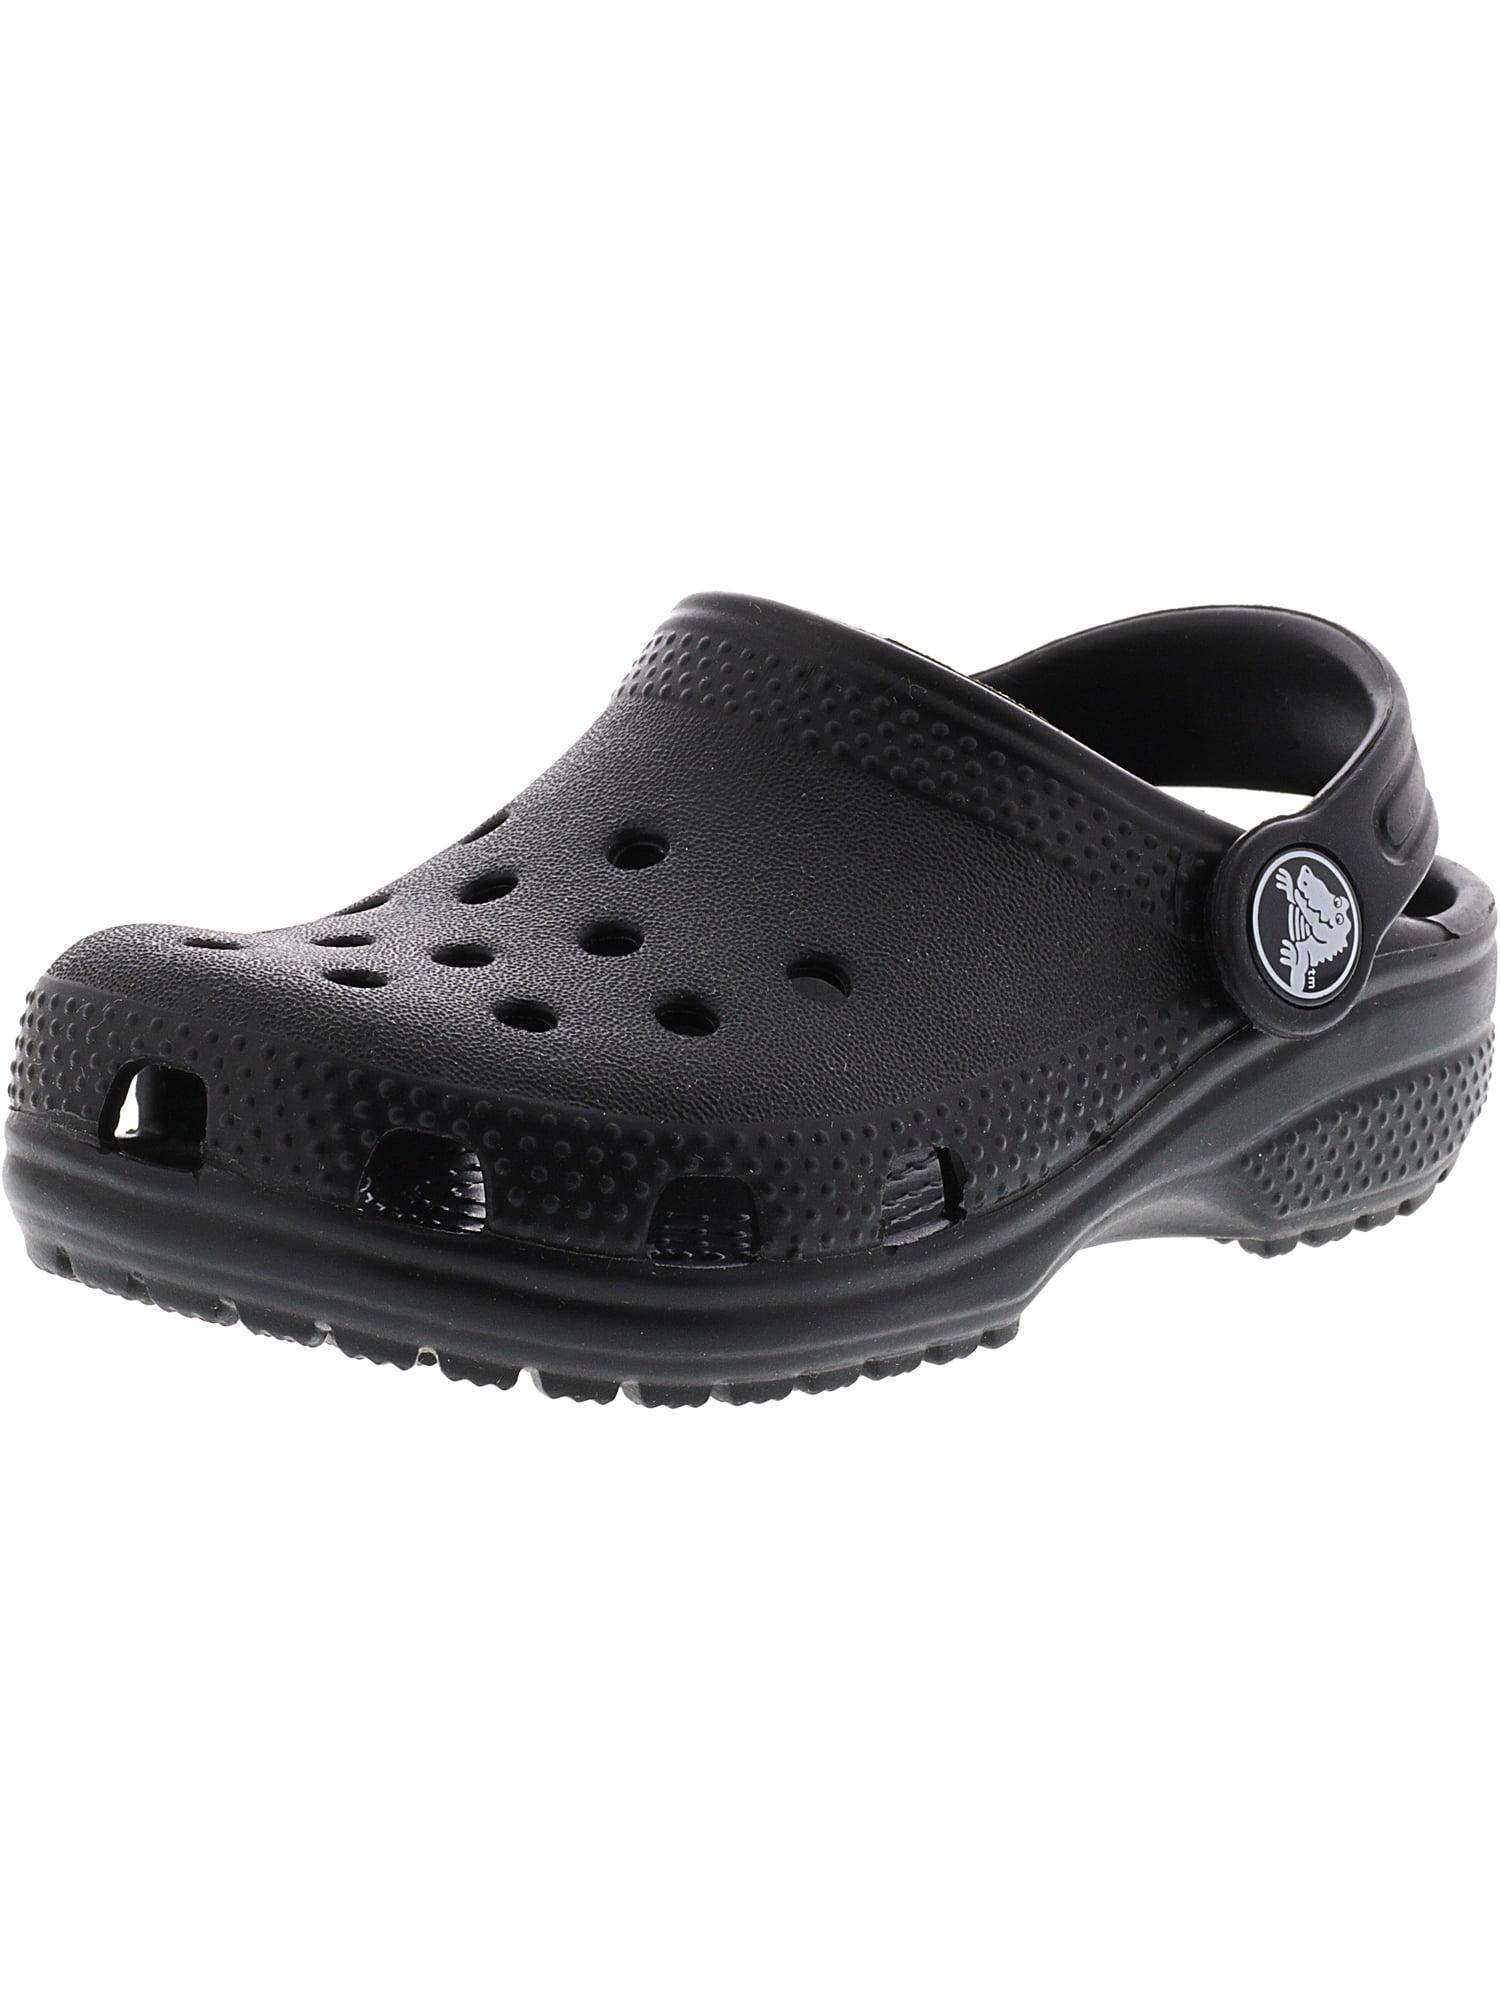 83d278755e Crocs Kids Classic Clog Ltd Kelly Green Clogs - 13M